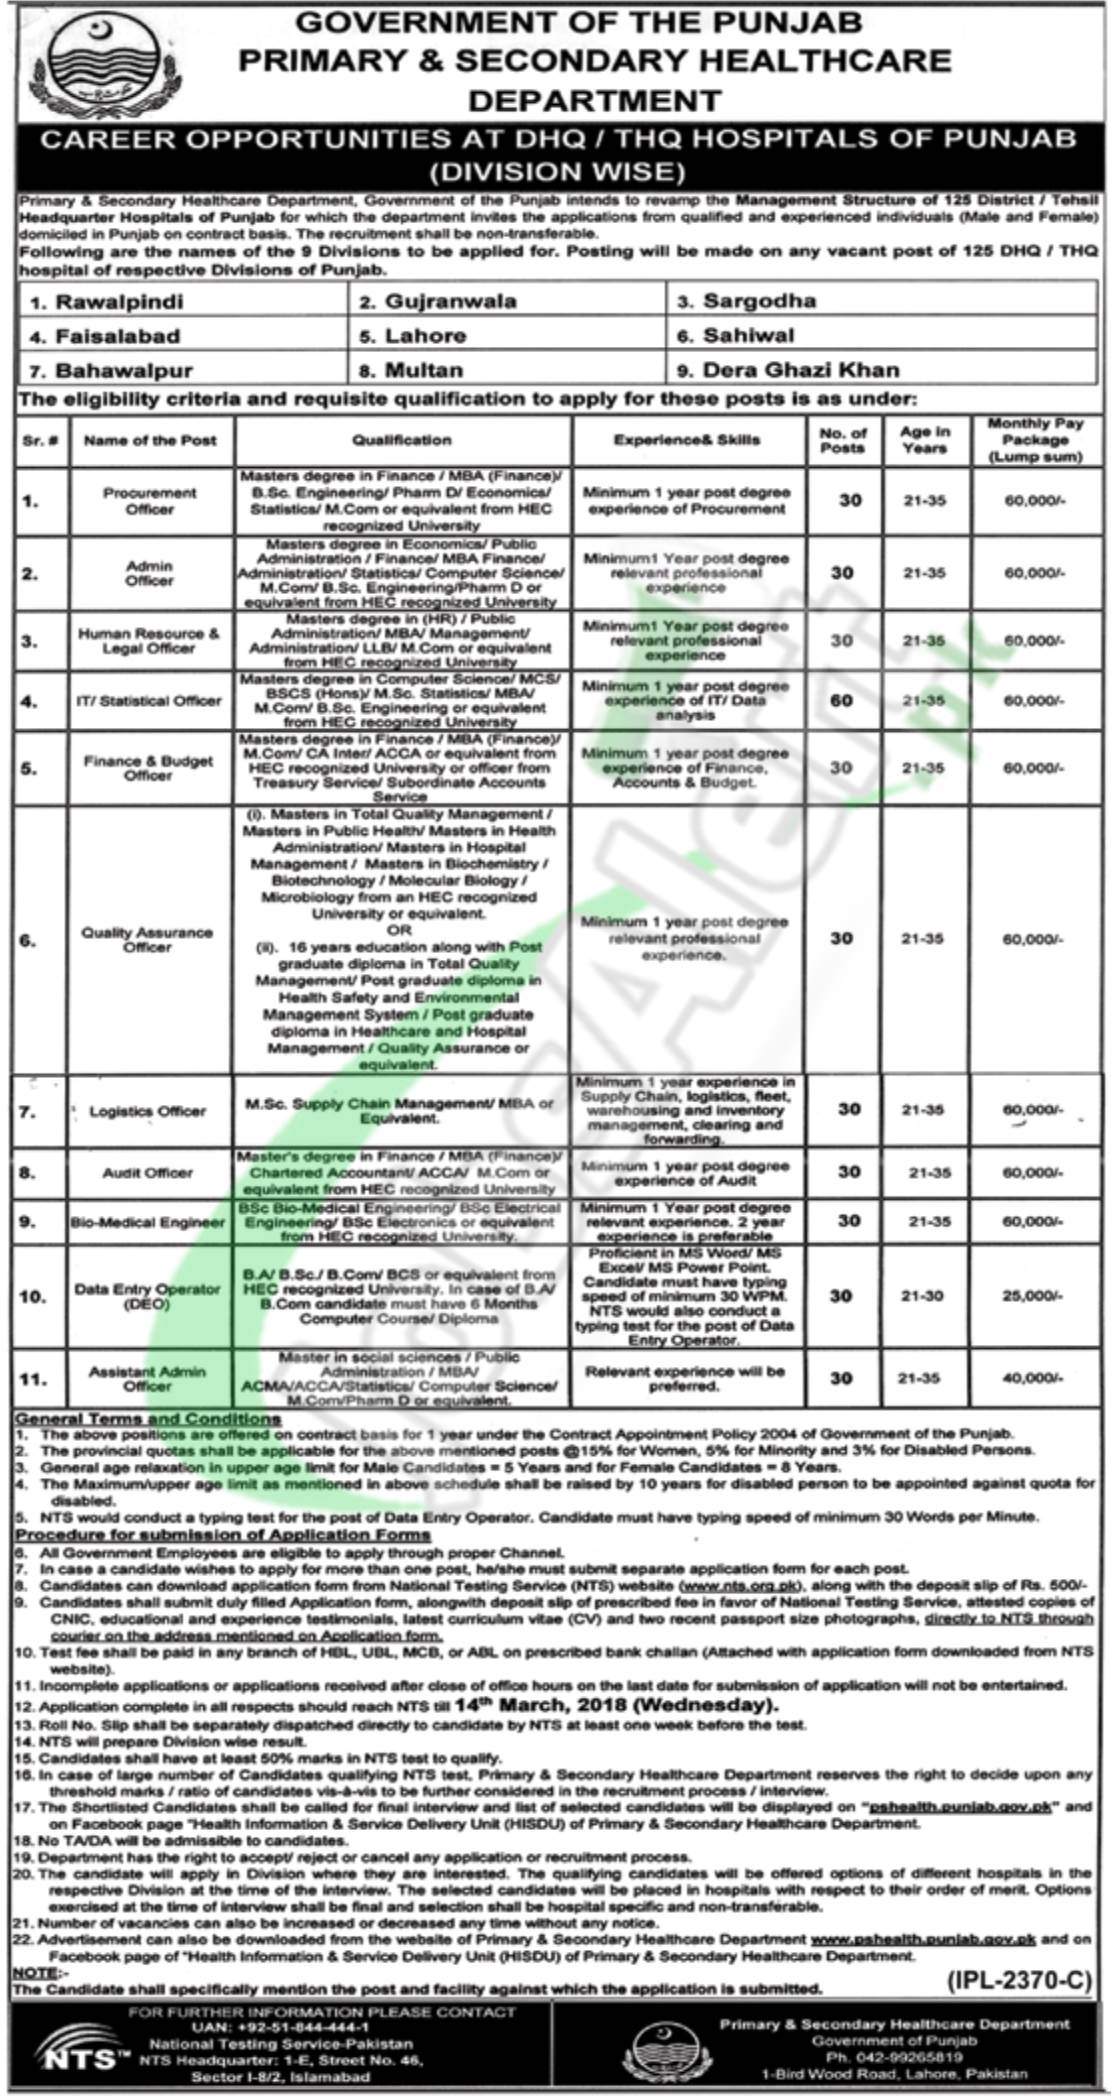 P&S Healthcare Department Punjab Jobs